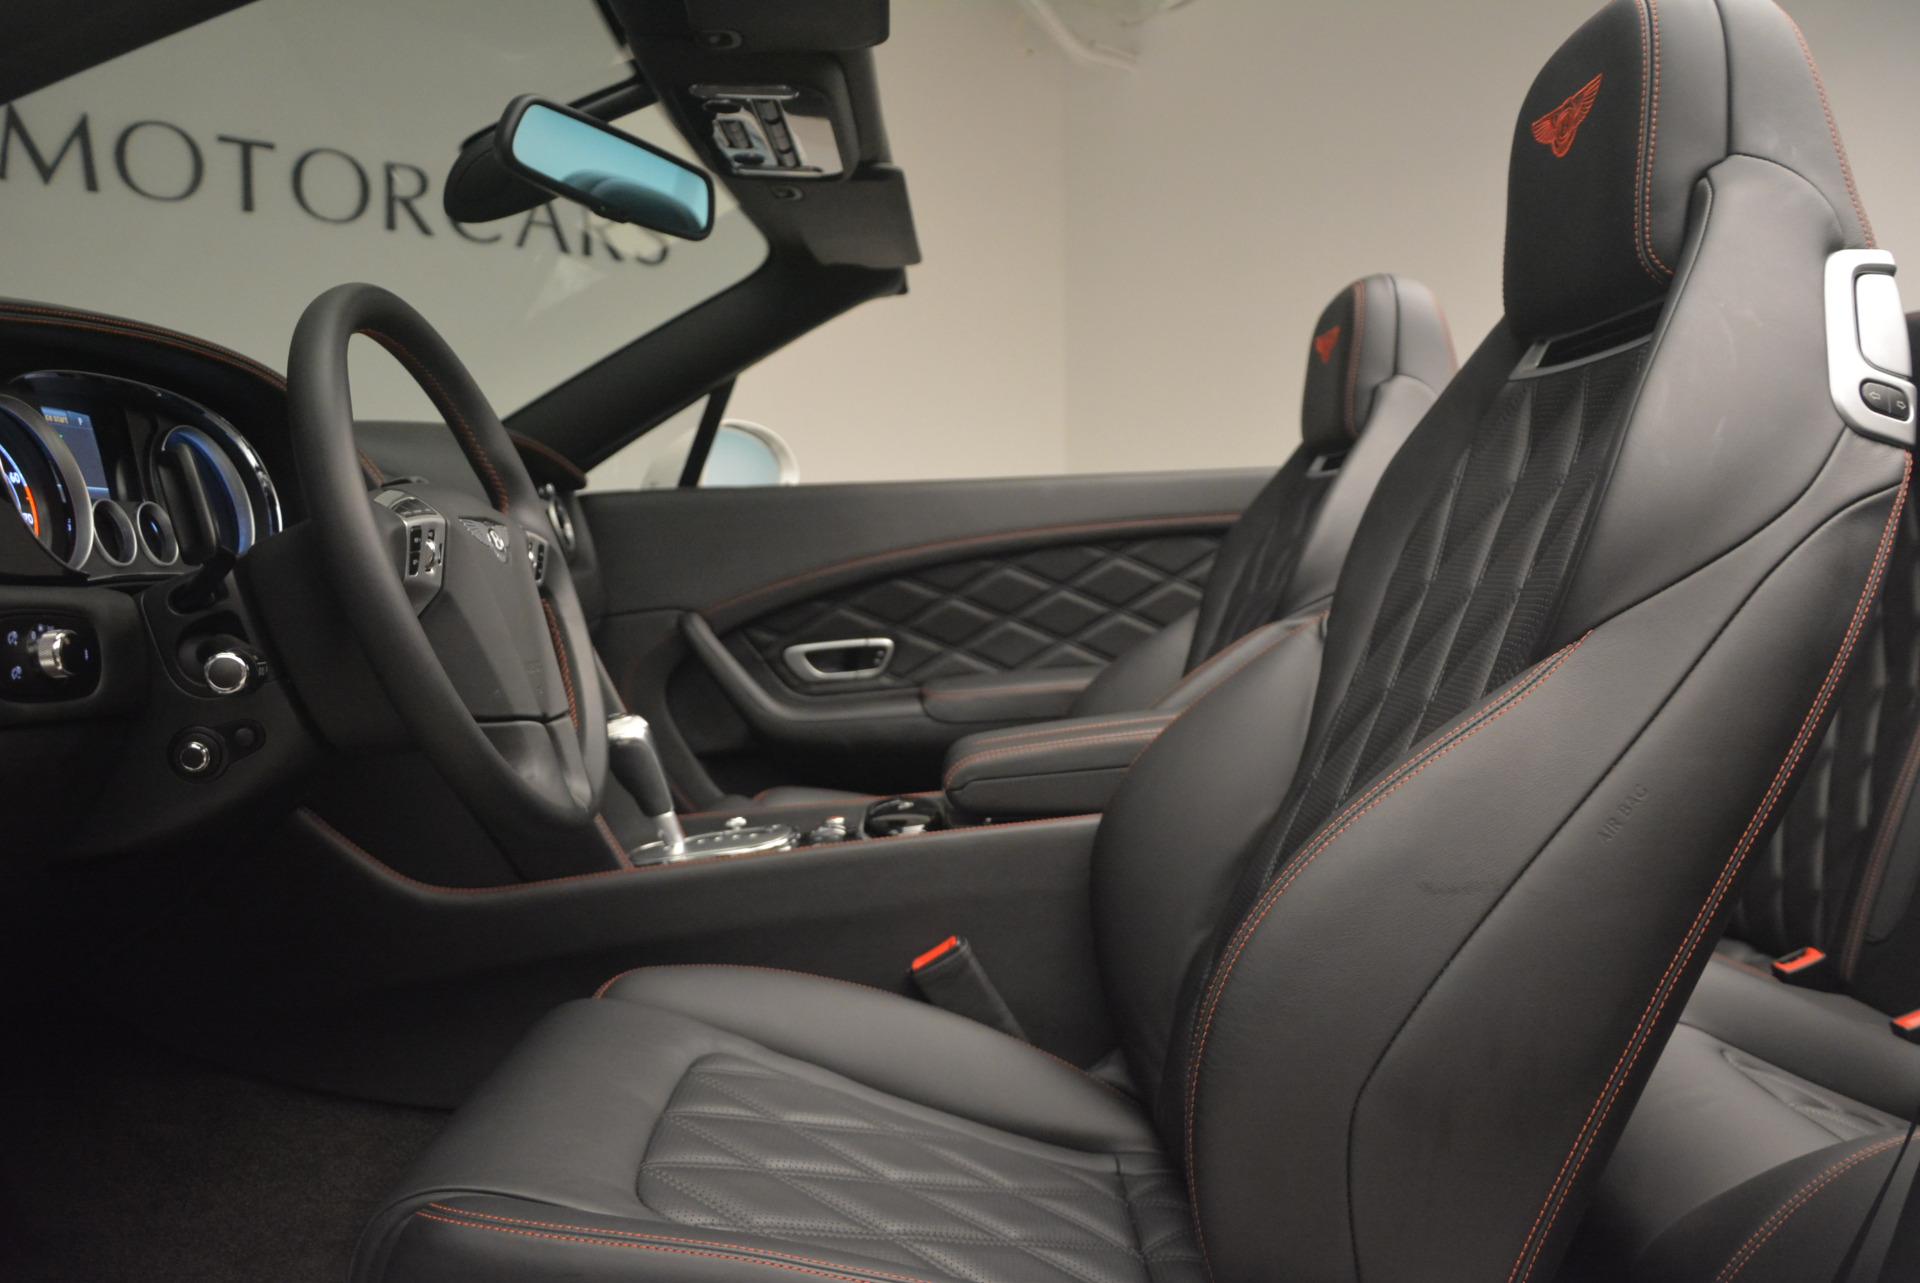 Used 2014 Bentley Continental GT Speed For Sale In Westport, CT 1129_p32